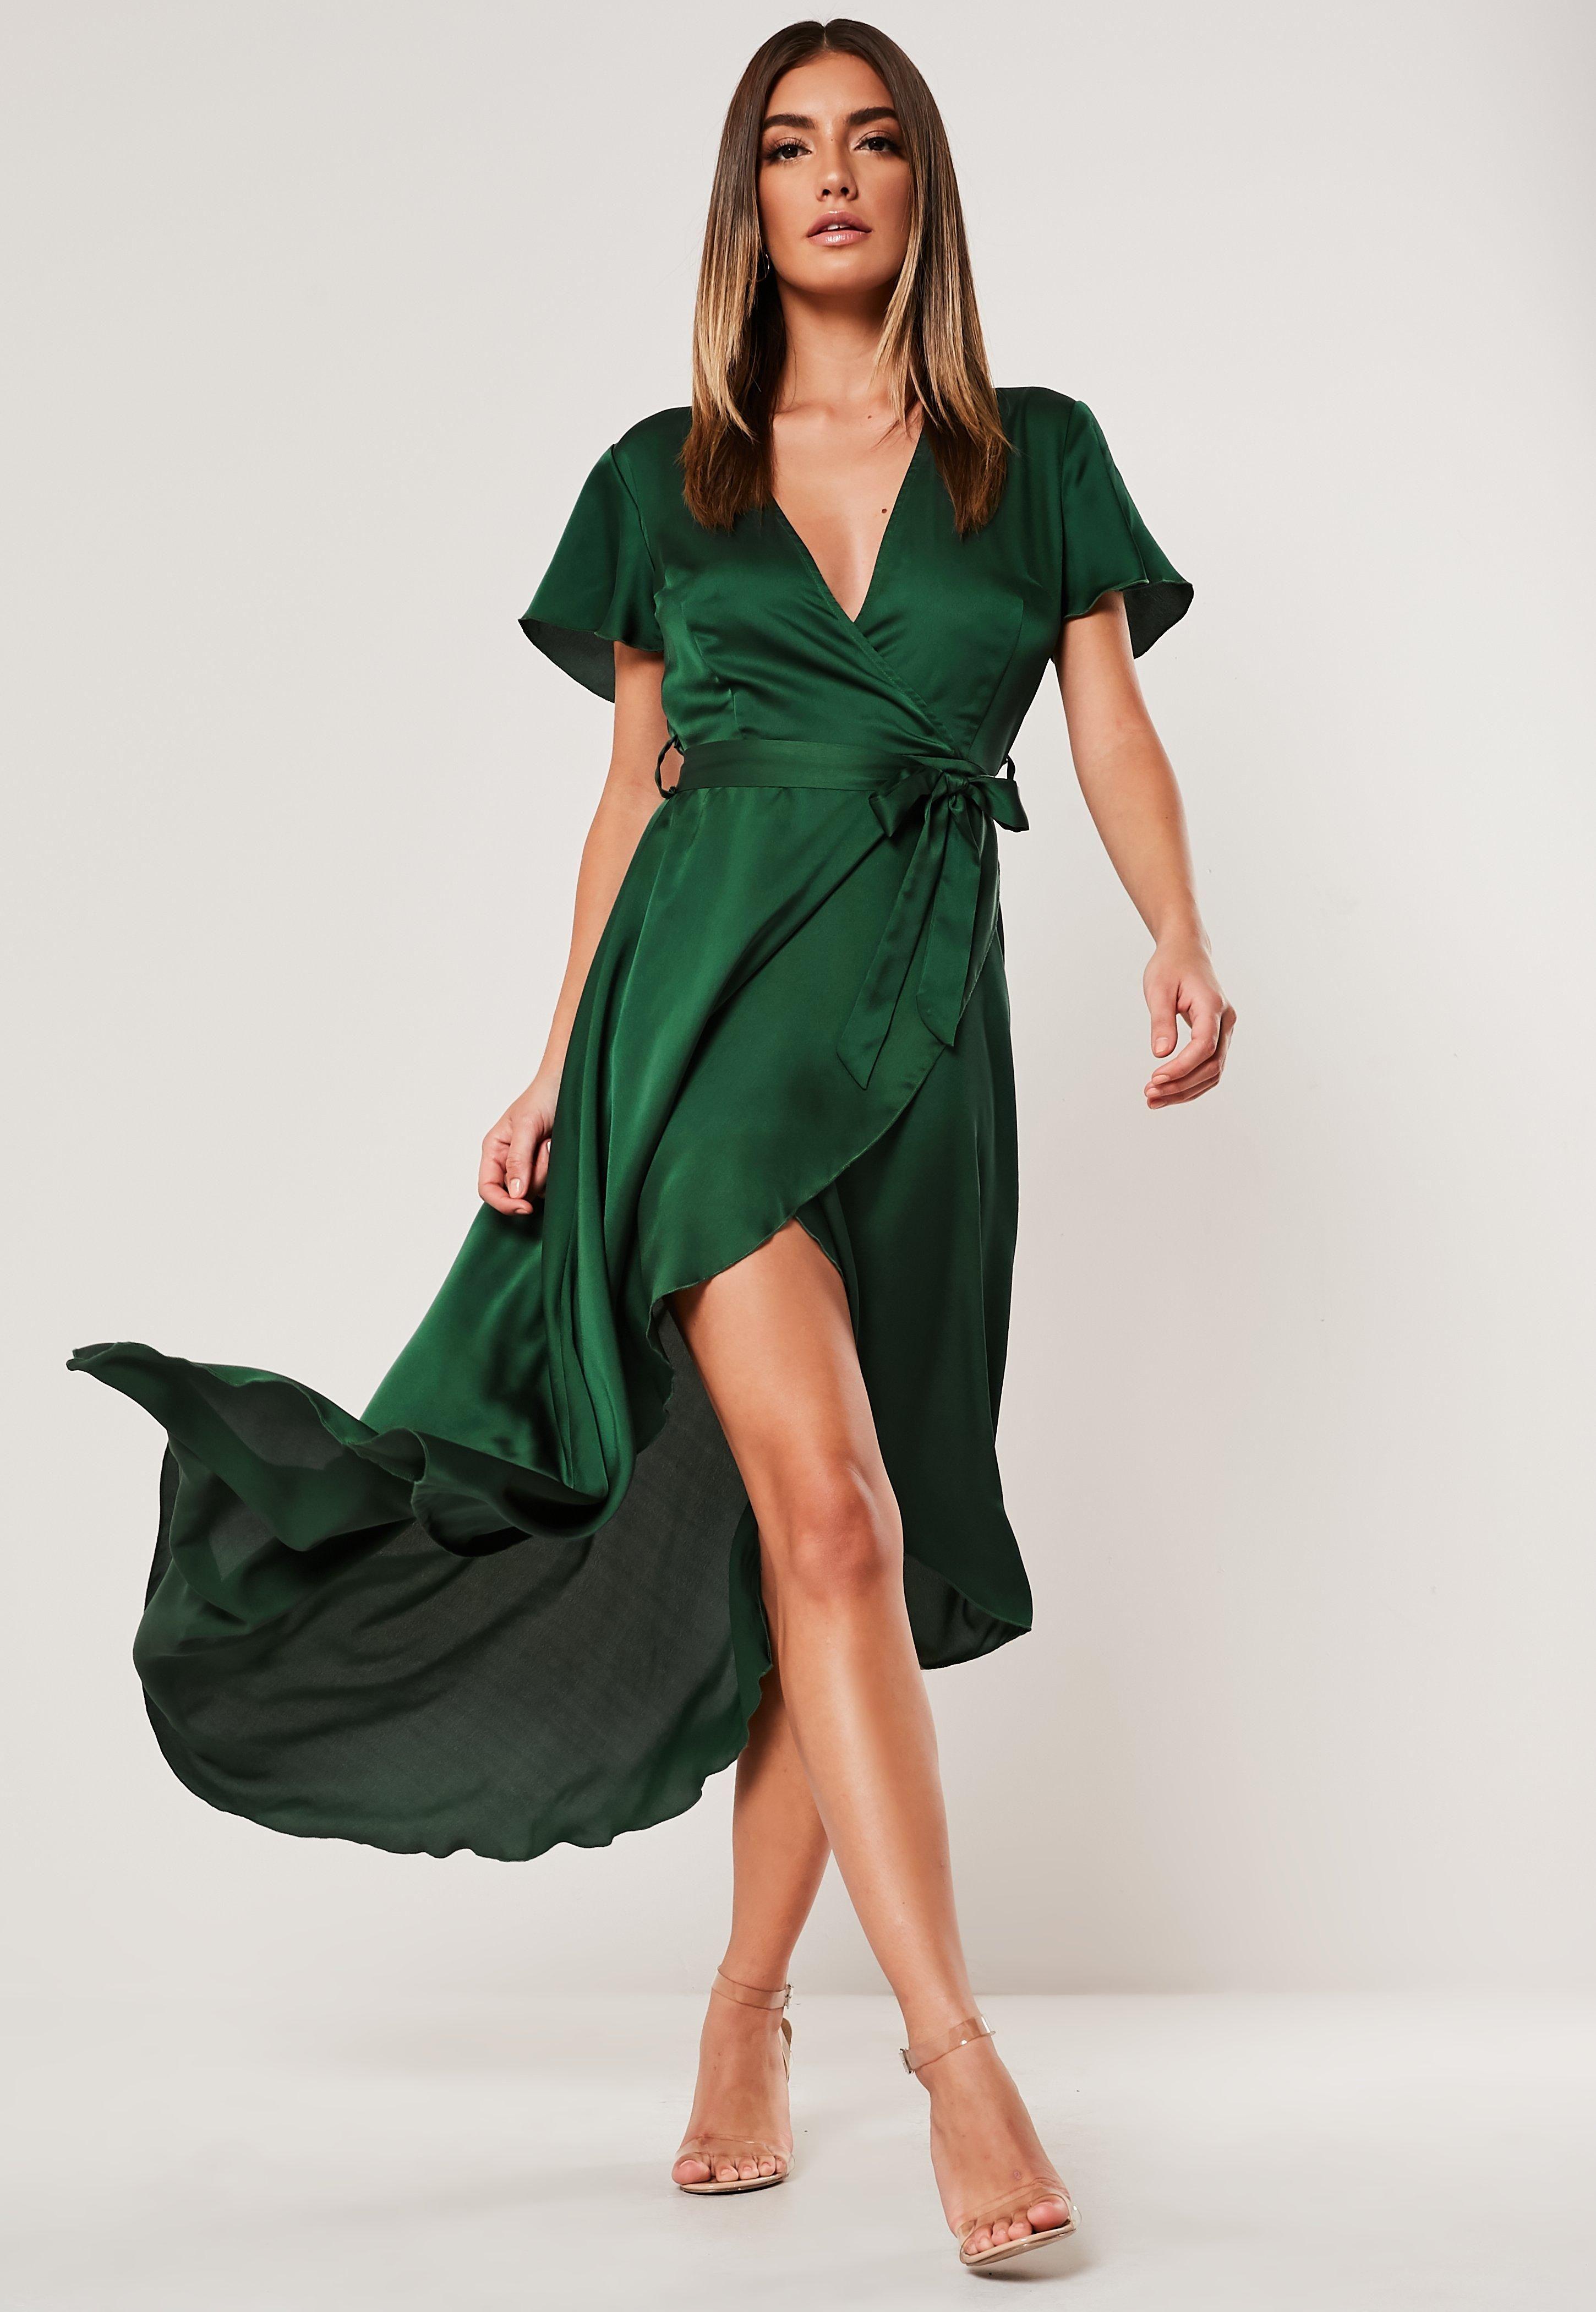 Green Satin Wrap Front Ruffle Midi Dress Sponsored Wrap Sponsored Satin Green Green Midi Dress Midi Dress With Sleeves Satin Long Sleeve [ 4200 x 2900 Pixel ]